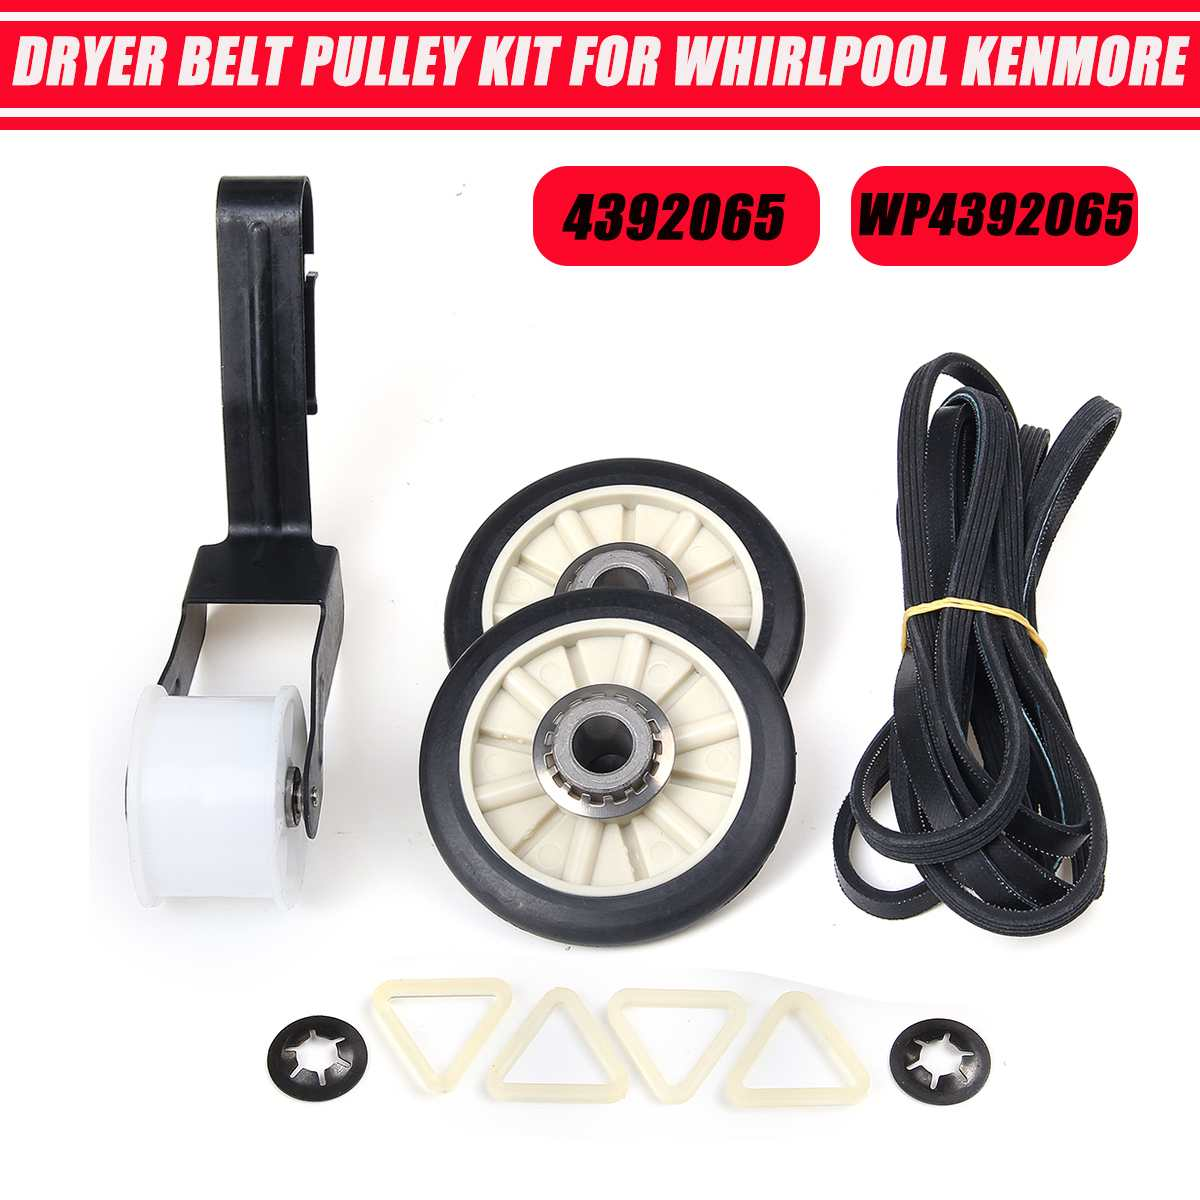 Dryer Belt Roller Kit For Whirlpool Kenmore WPW10314173 W10314171 4392065 WP4392065 691366 341241 349241T